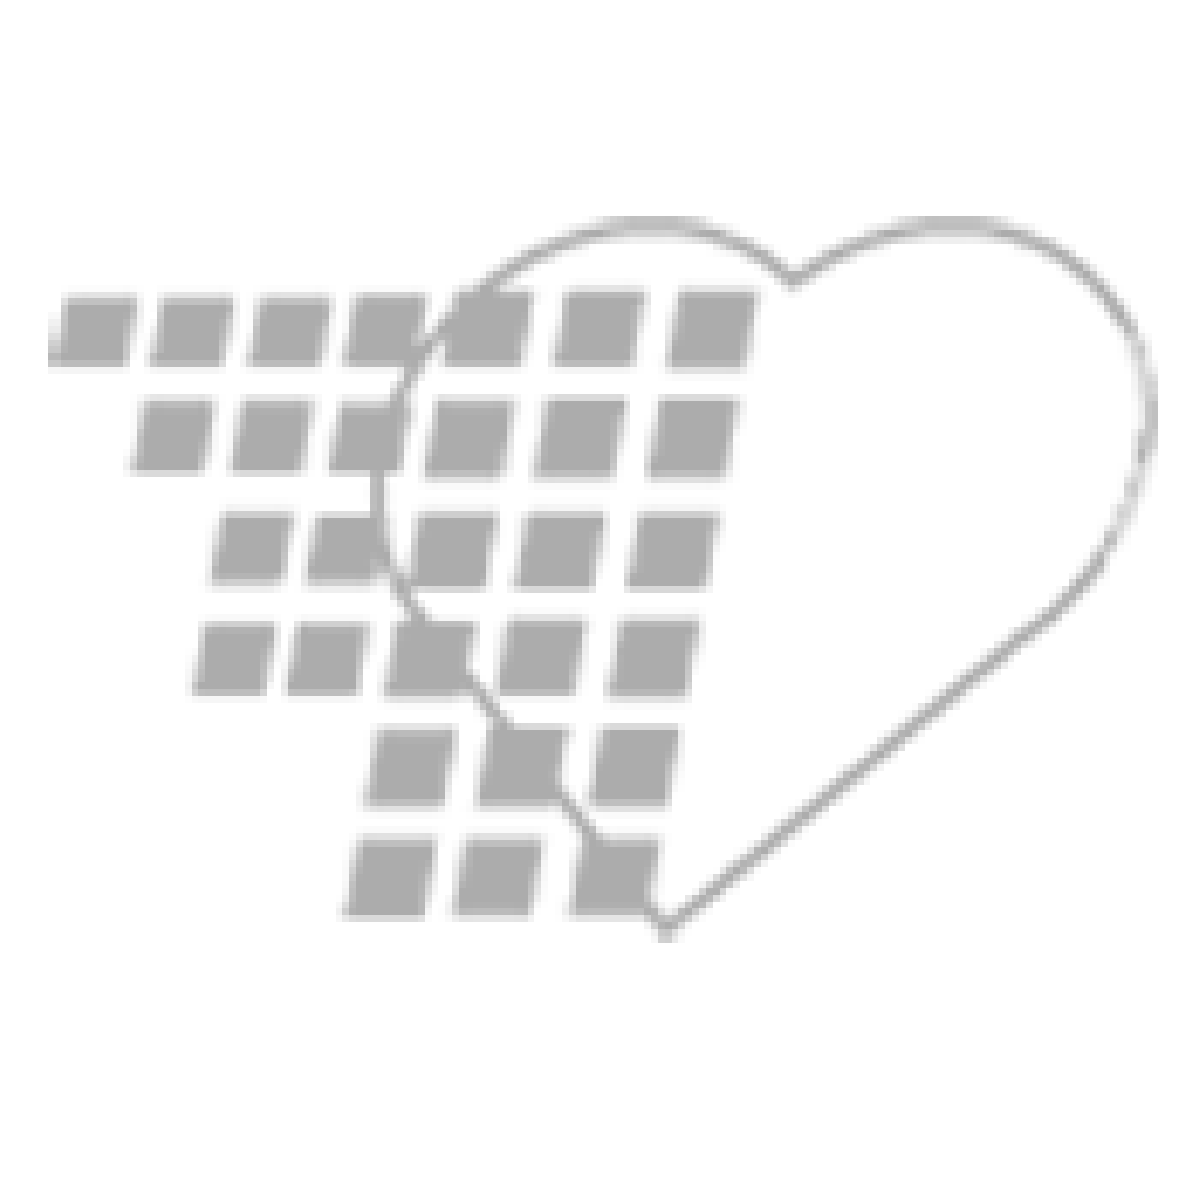 09-98-1002 - Virtual Education System - Nursing, 1-199 Subscriptions